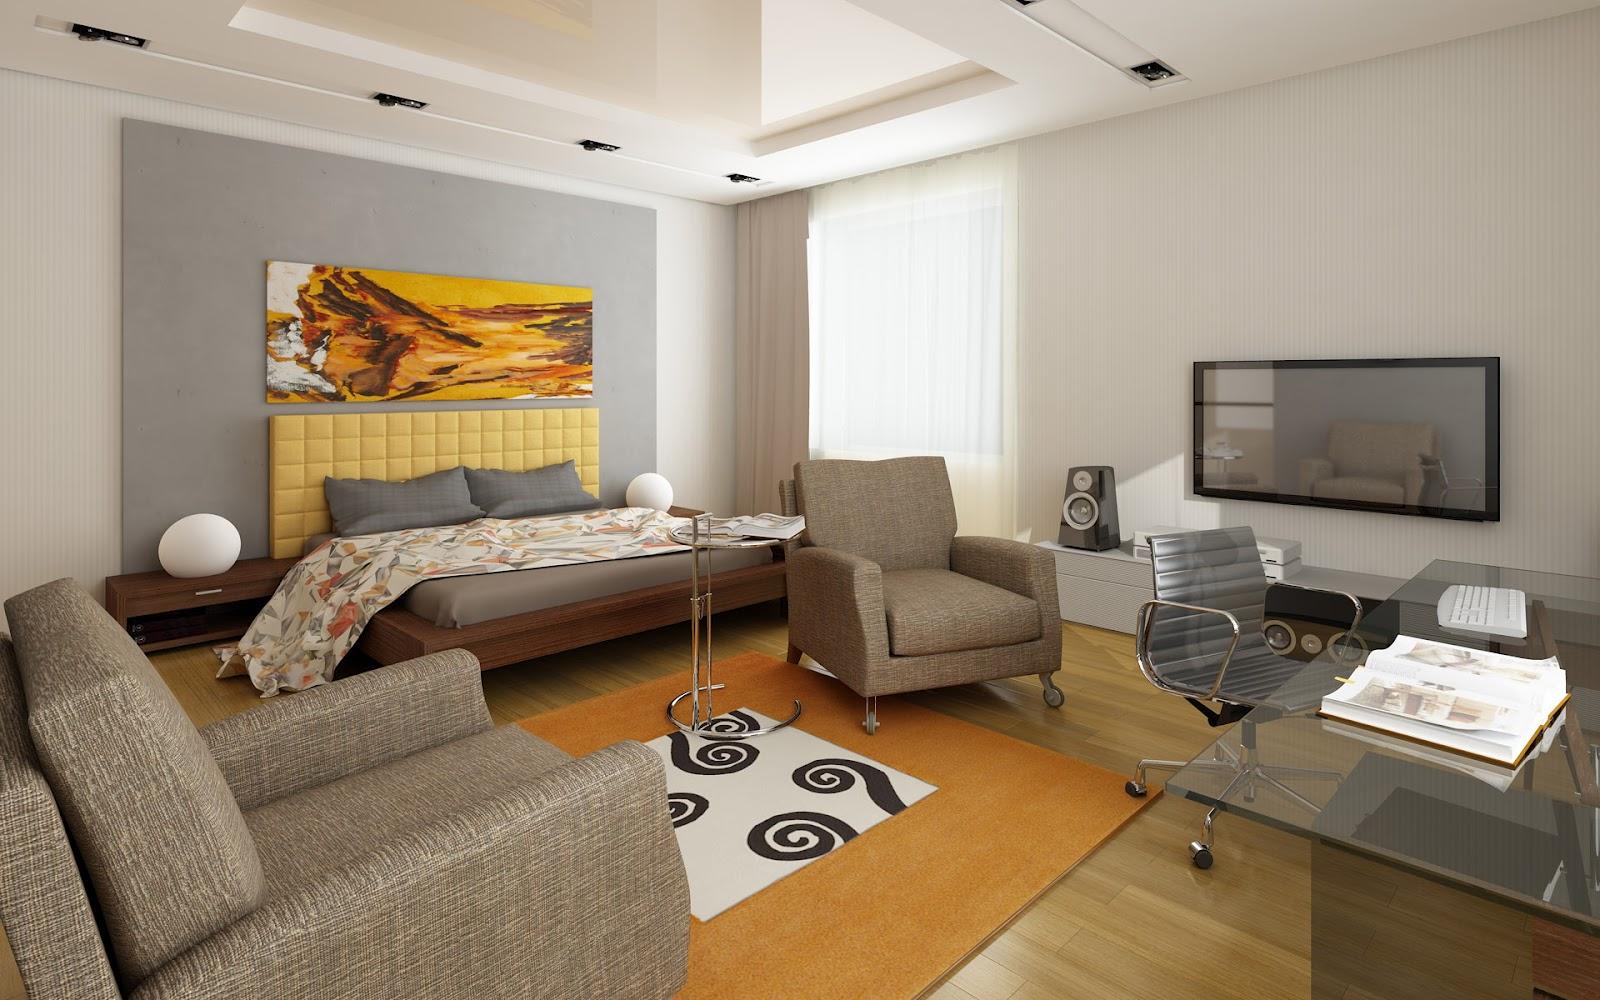 Michelli Lucas Designer De Interiores Refer Ncia De Sala De Tv -> Fotos De Salas De Tv